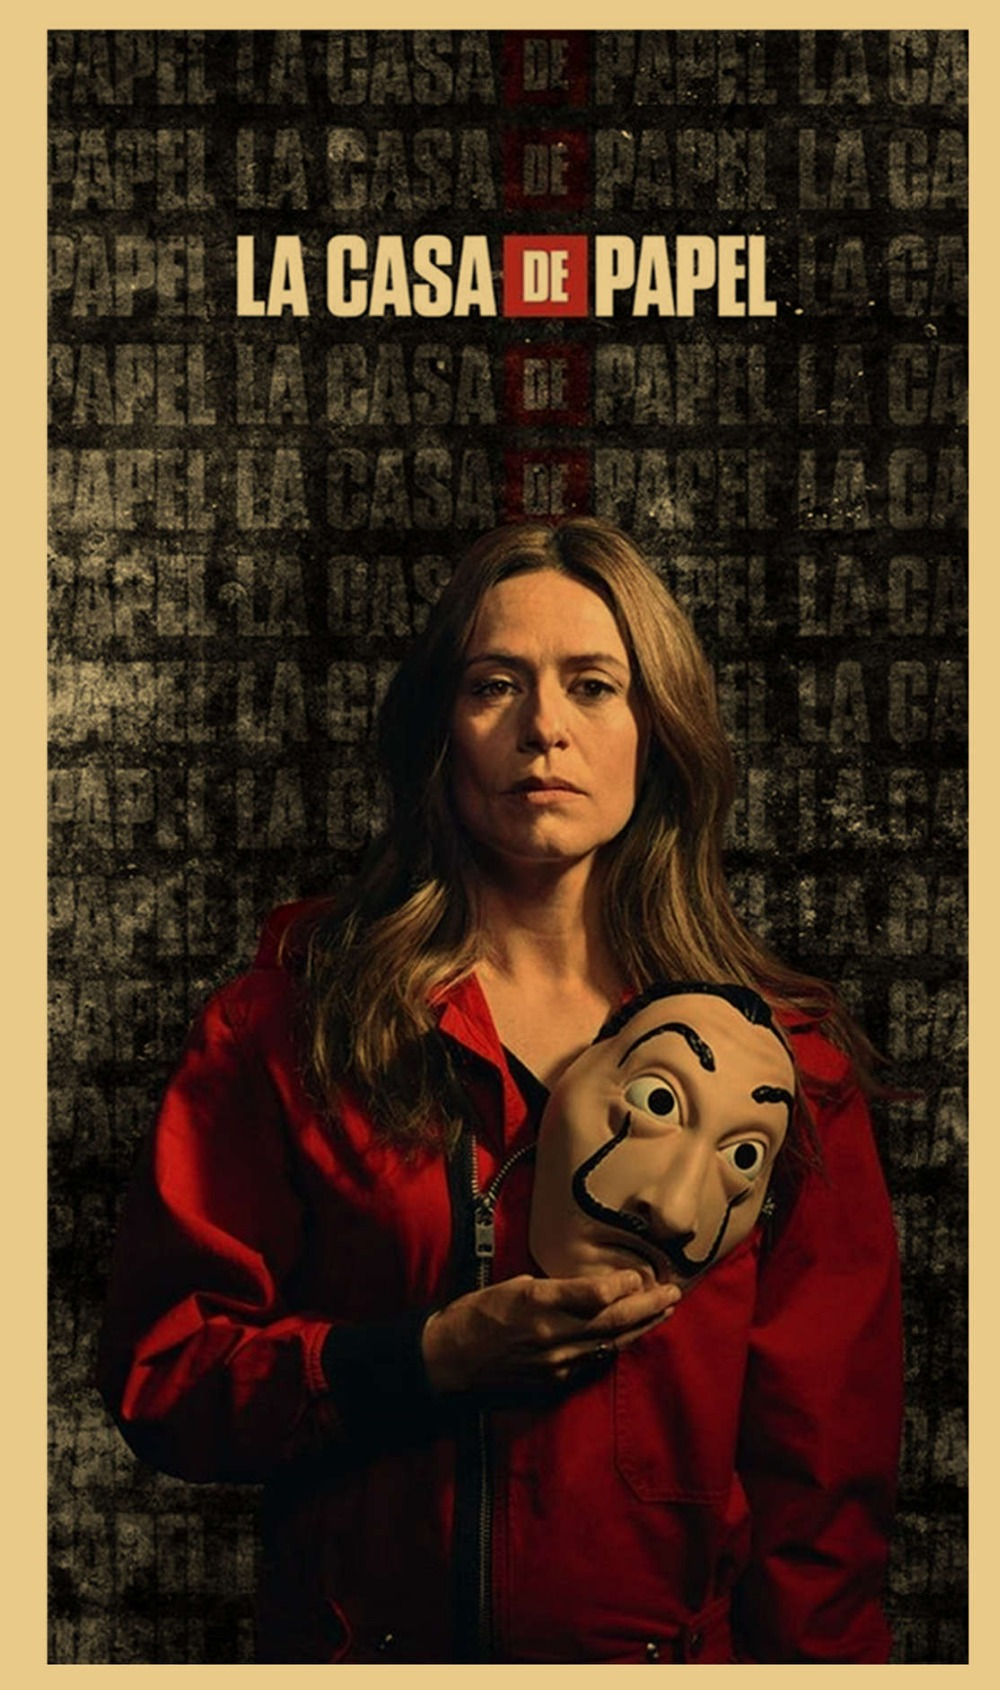 2019 latest Spanish hit high score suspense thriller crime